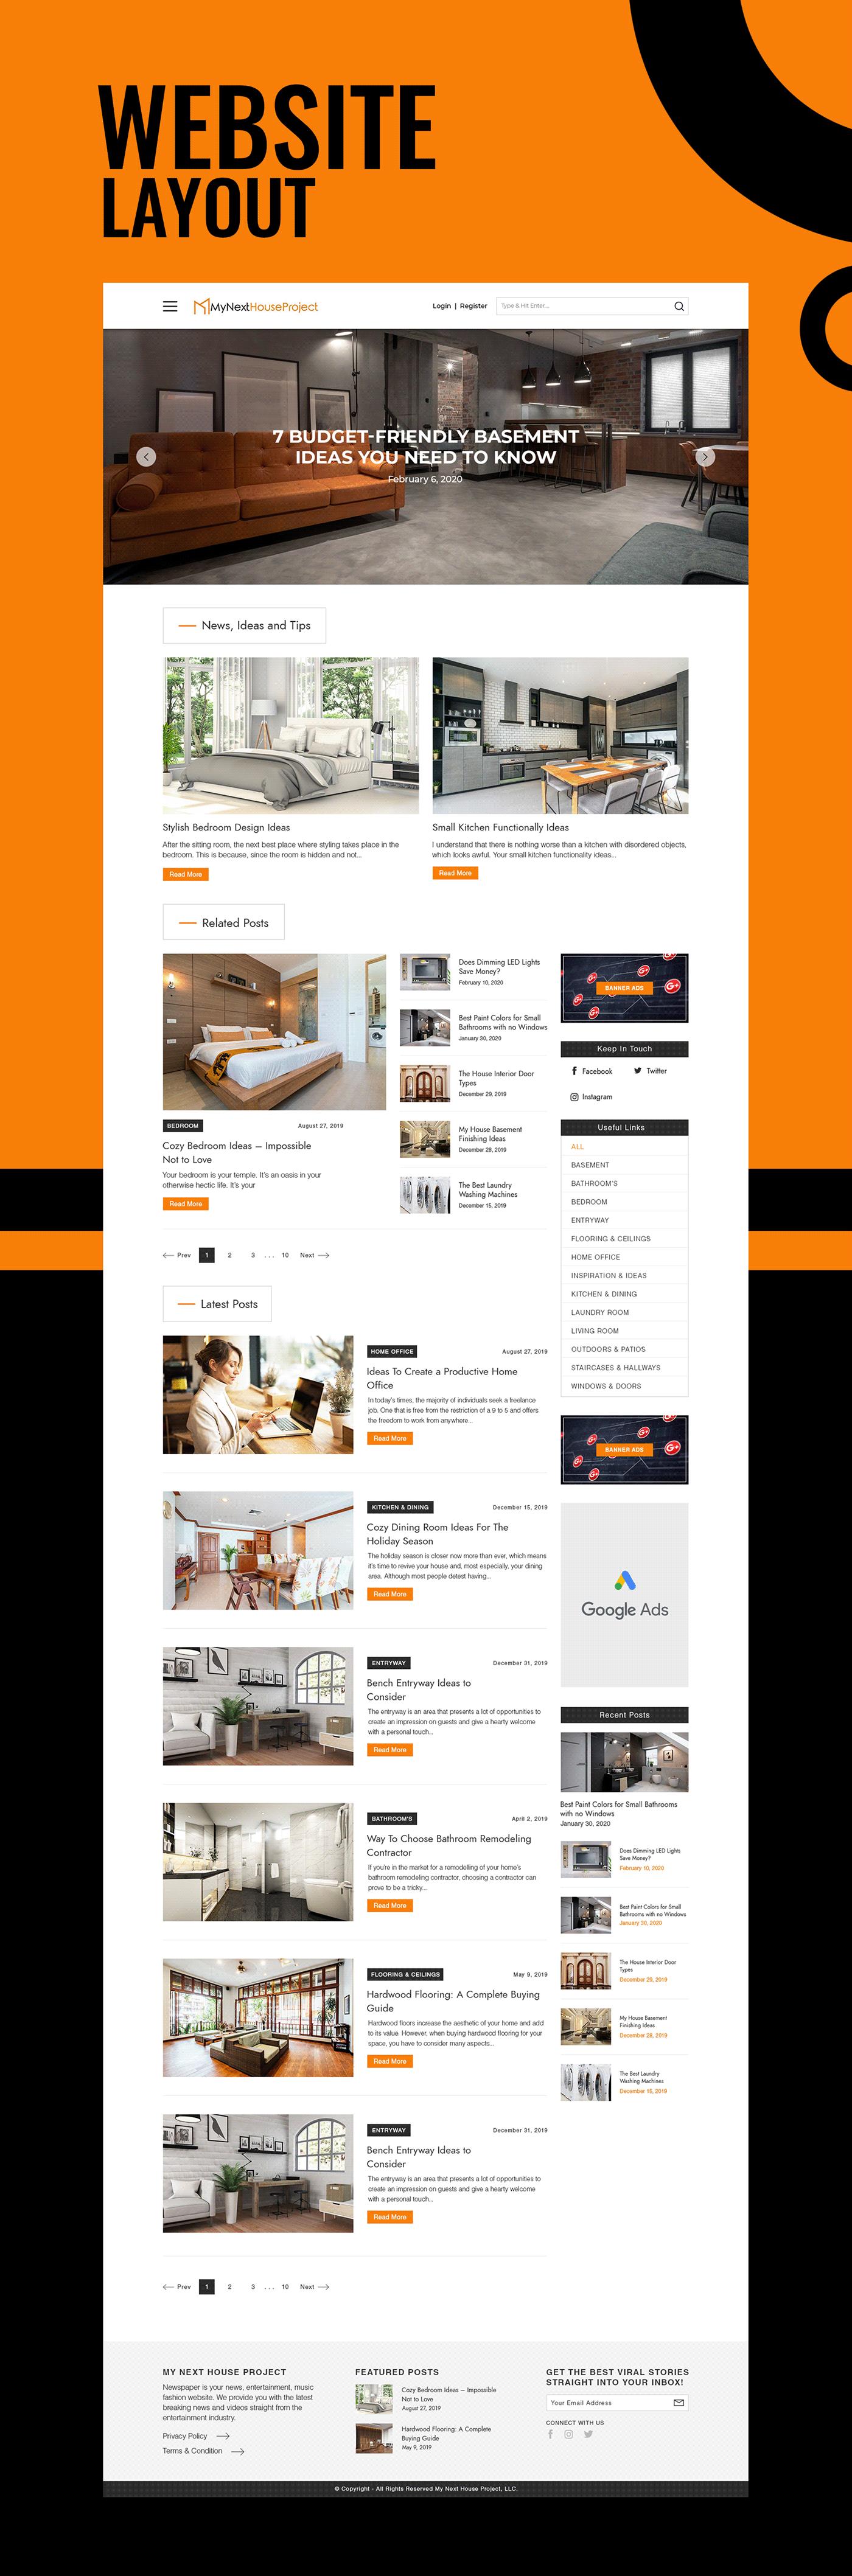 layoutdesign uiux websitedesign